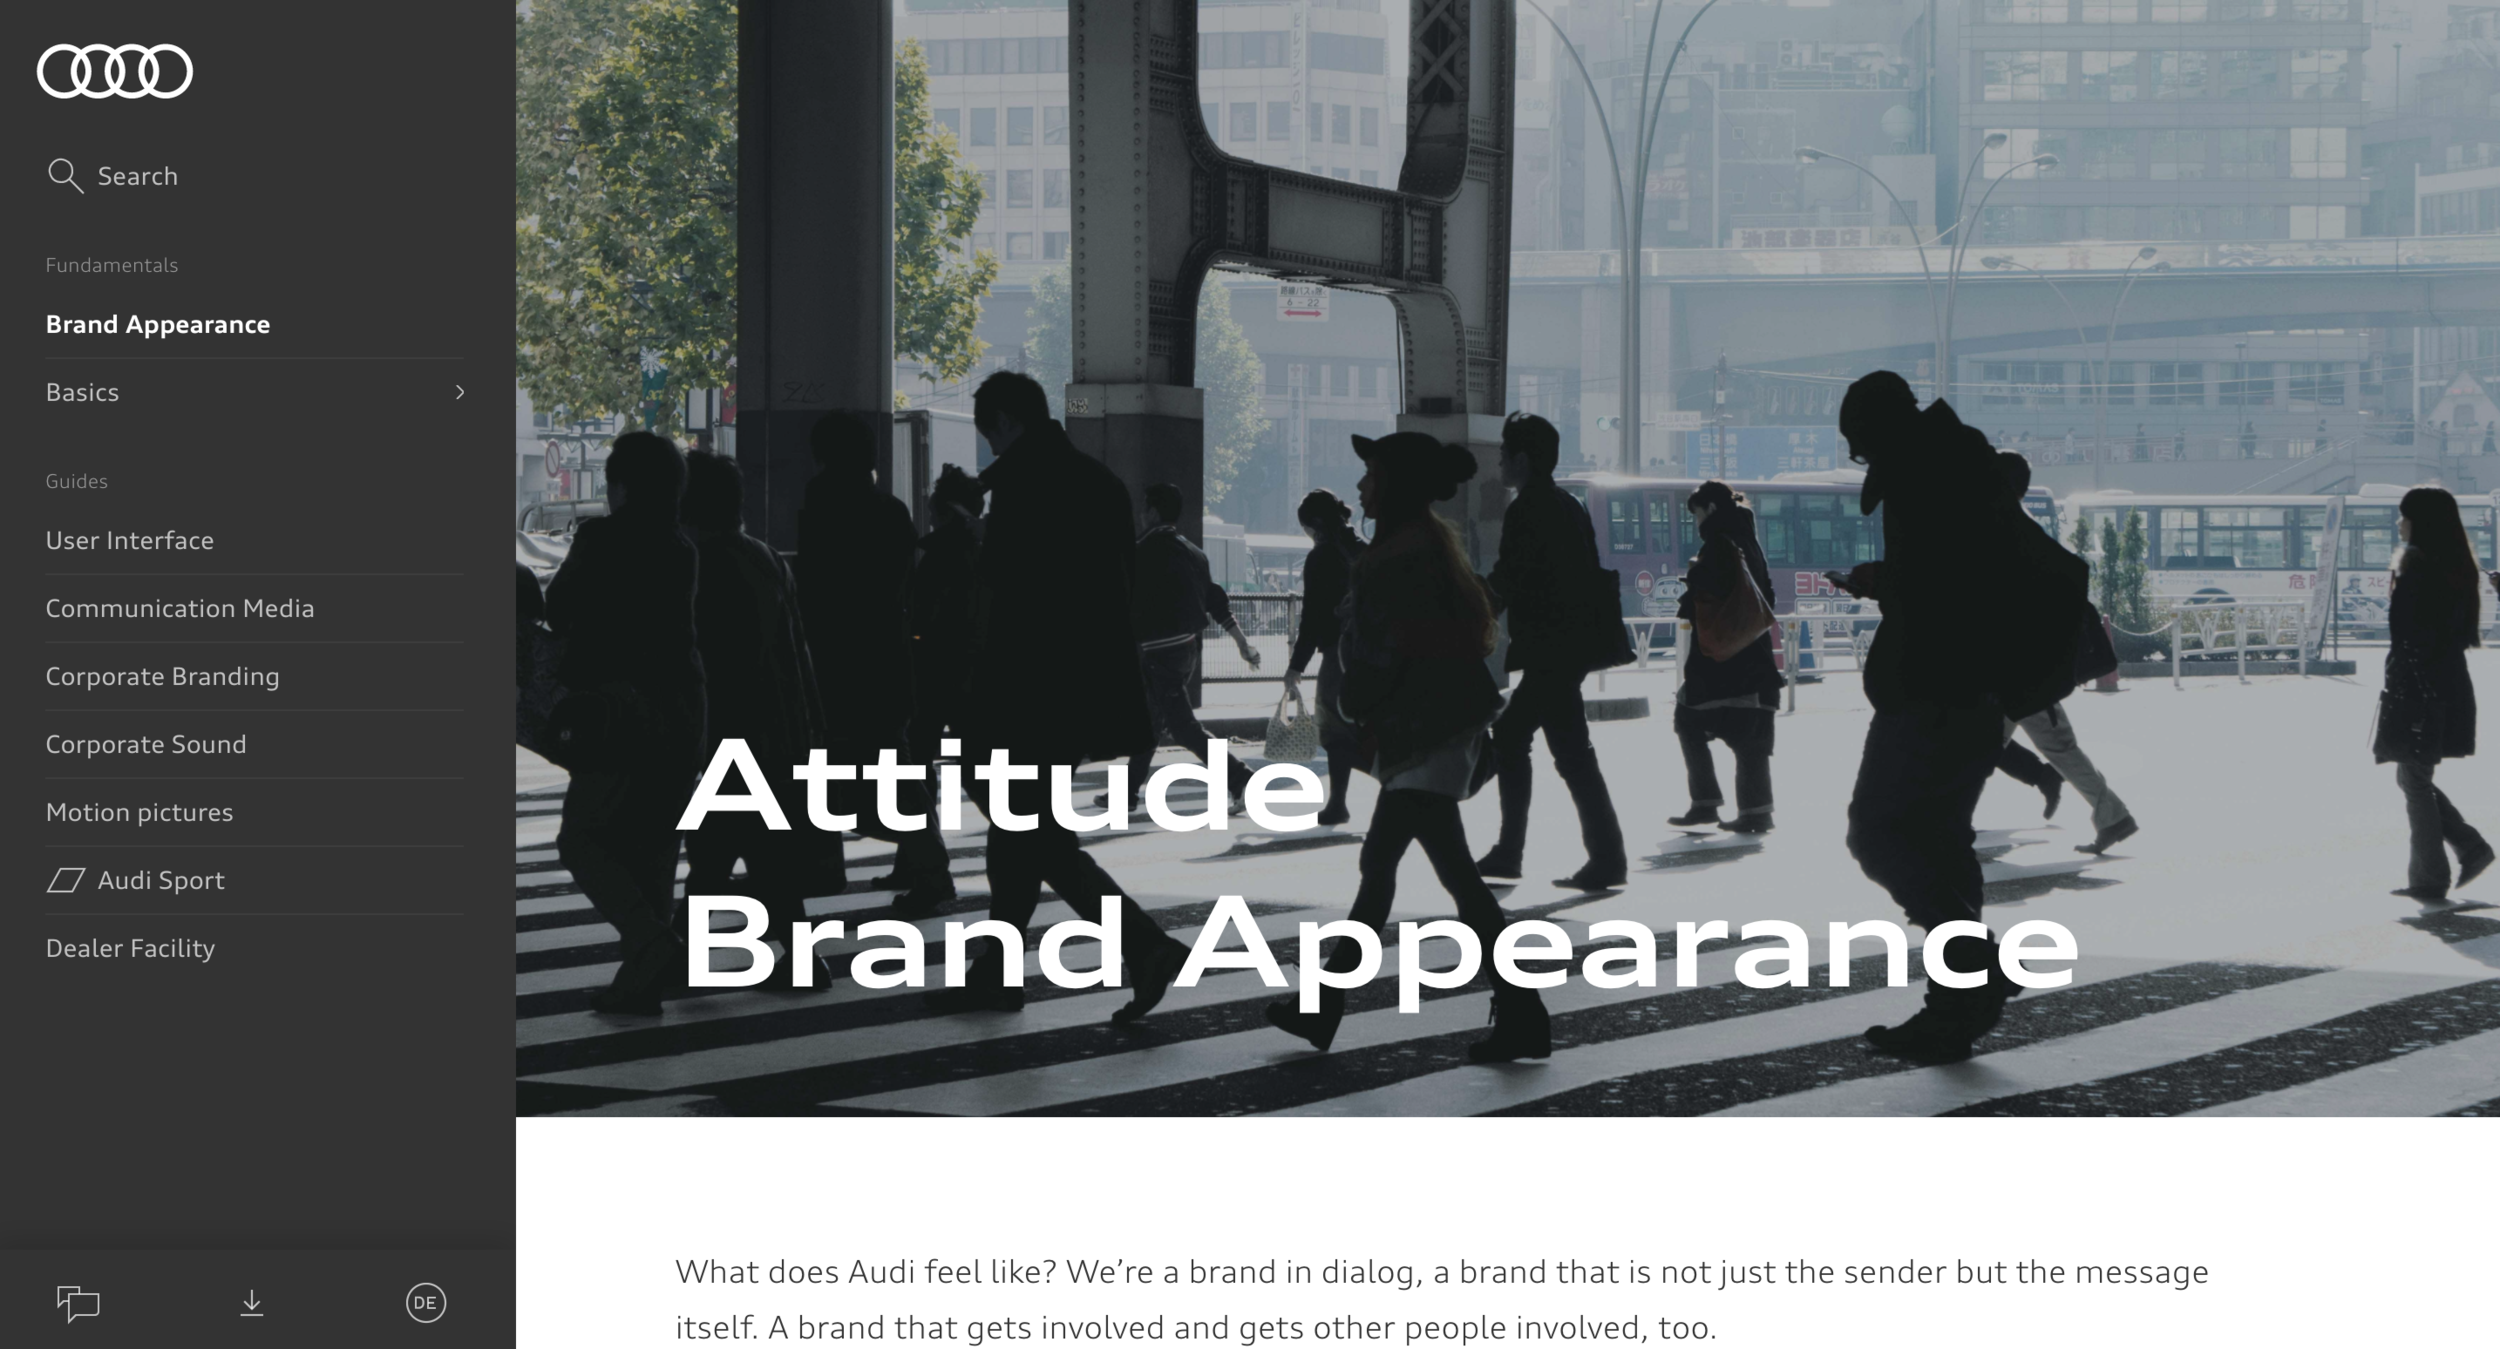 http://www.audi.com/ci/en/intro/brand-appearance.html#